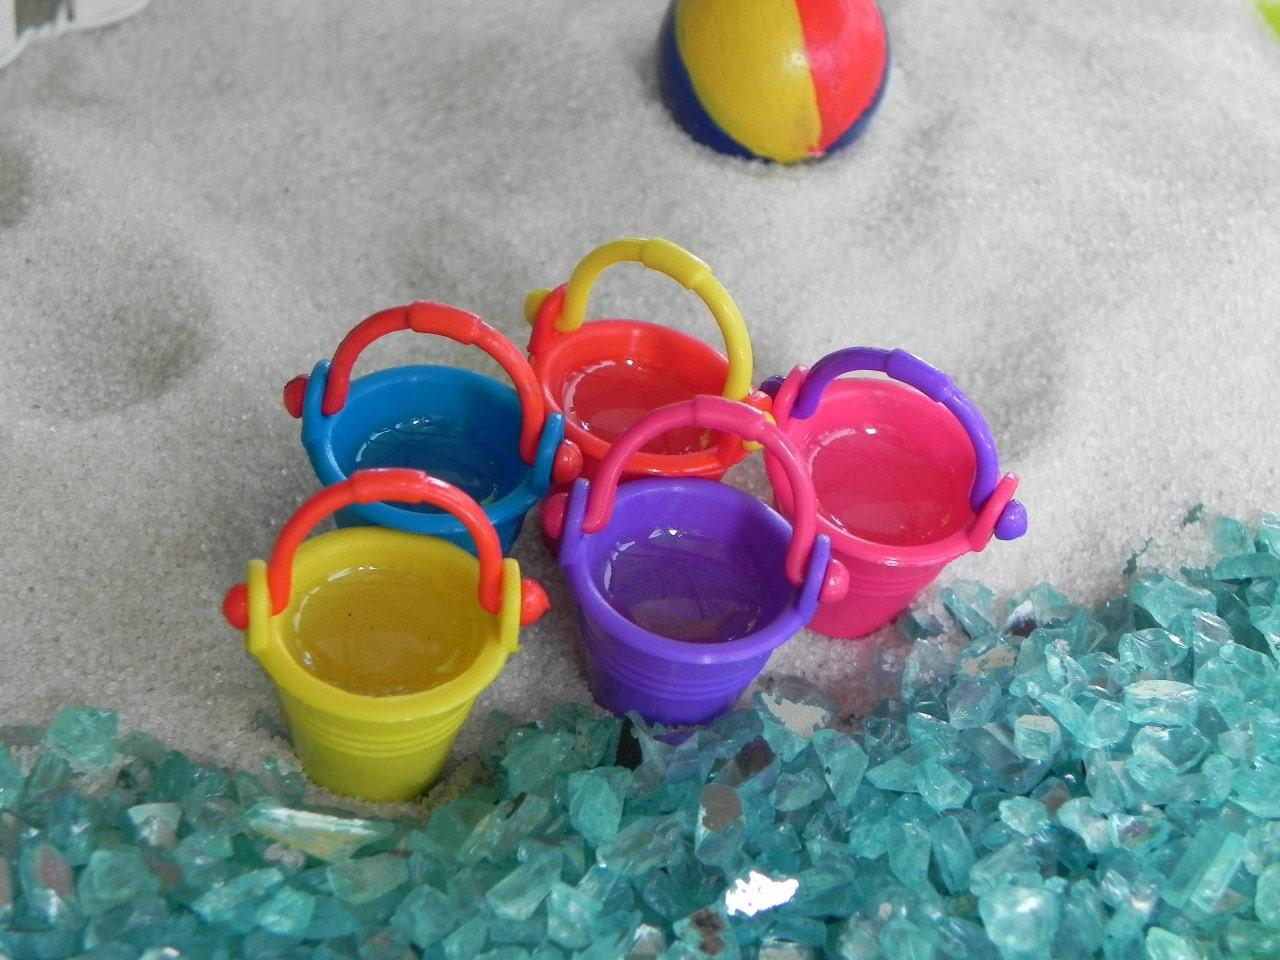 Gnome Garden: ONE Miniature Bucket Beach Pail Artificial Water Fairy Garden